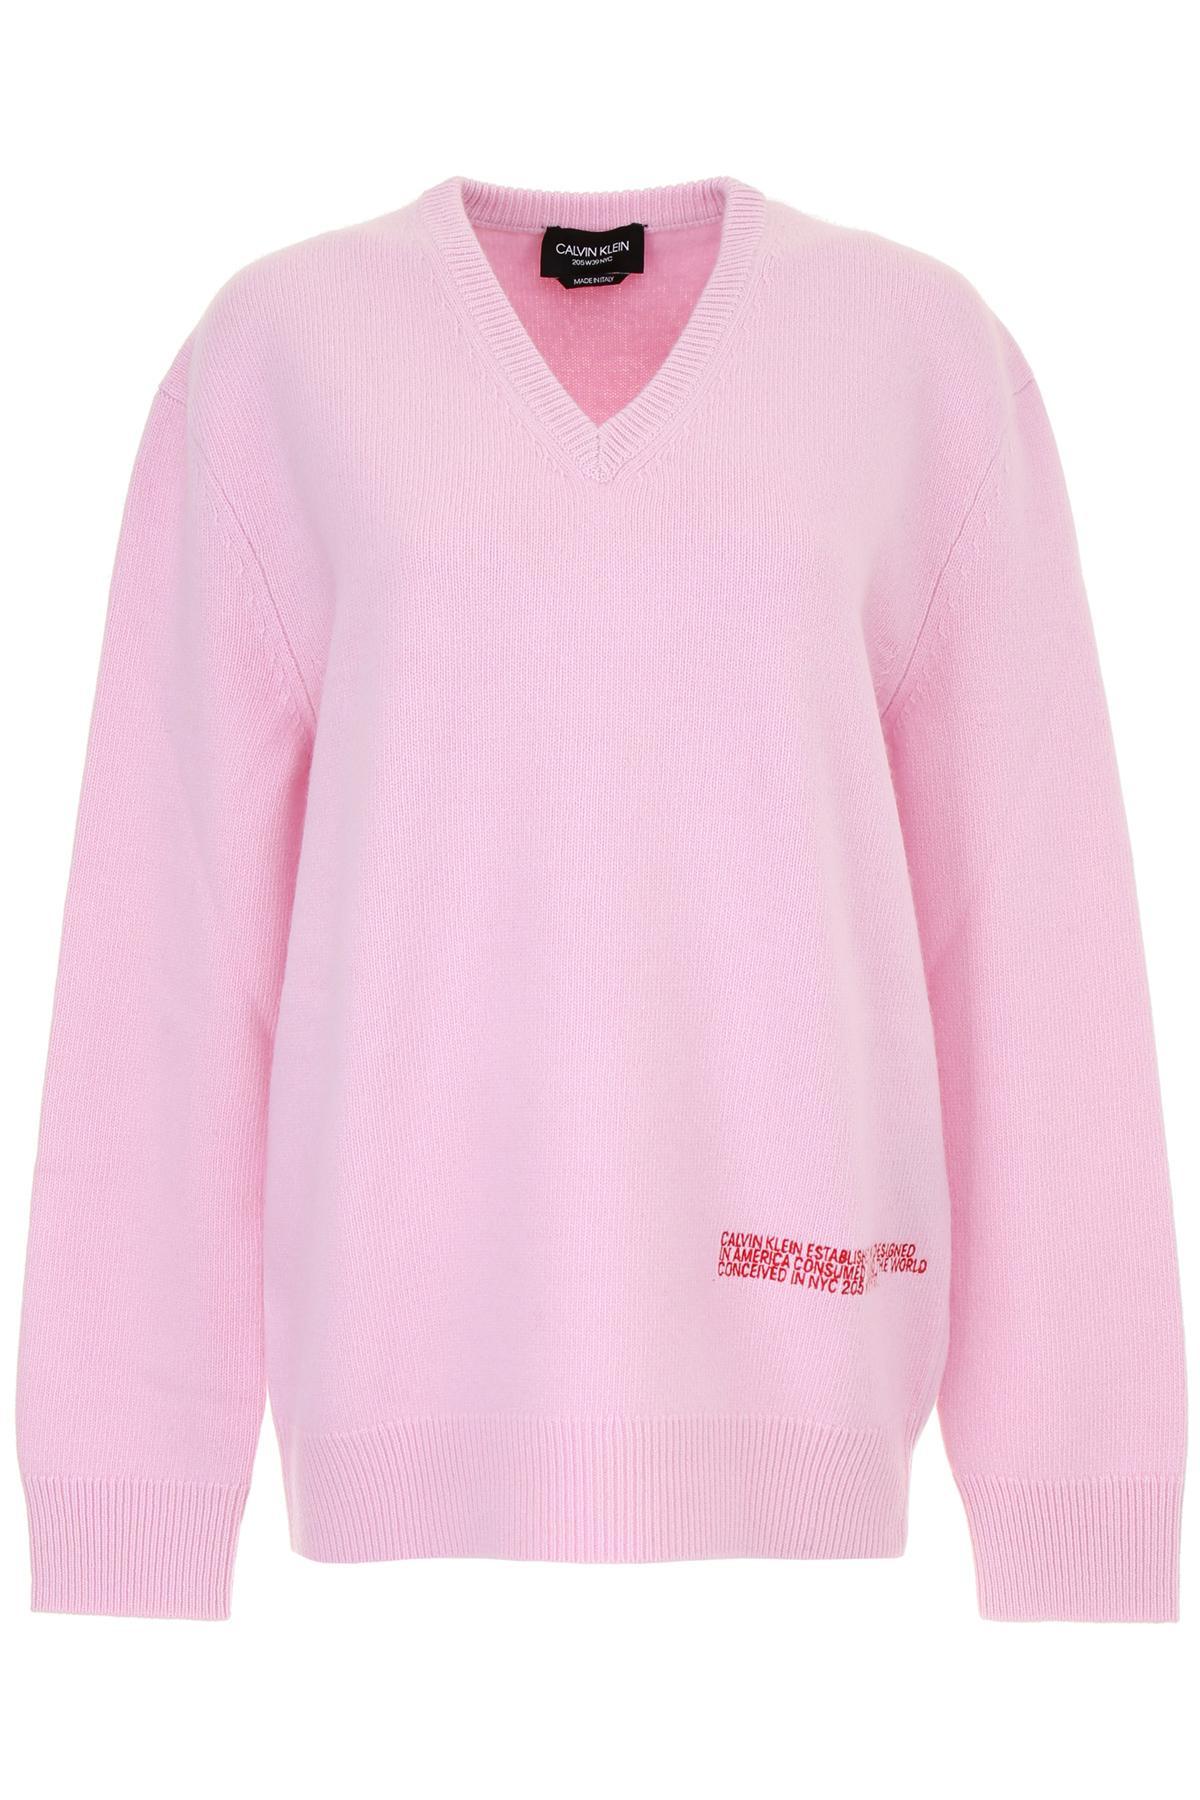 cheaper 62376 0570e Women's Pink Oversize Pullover